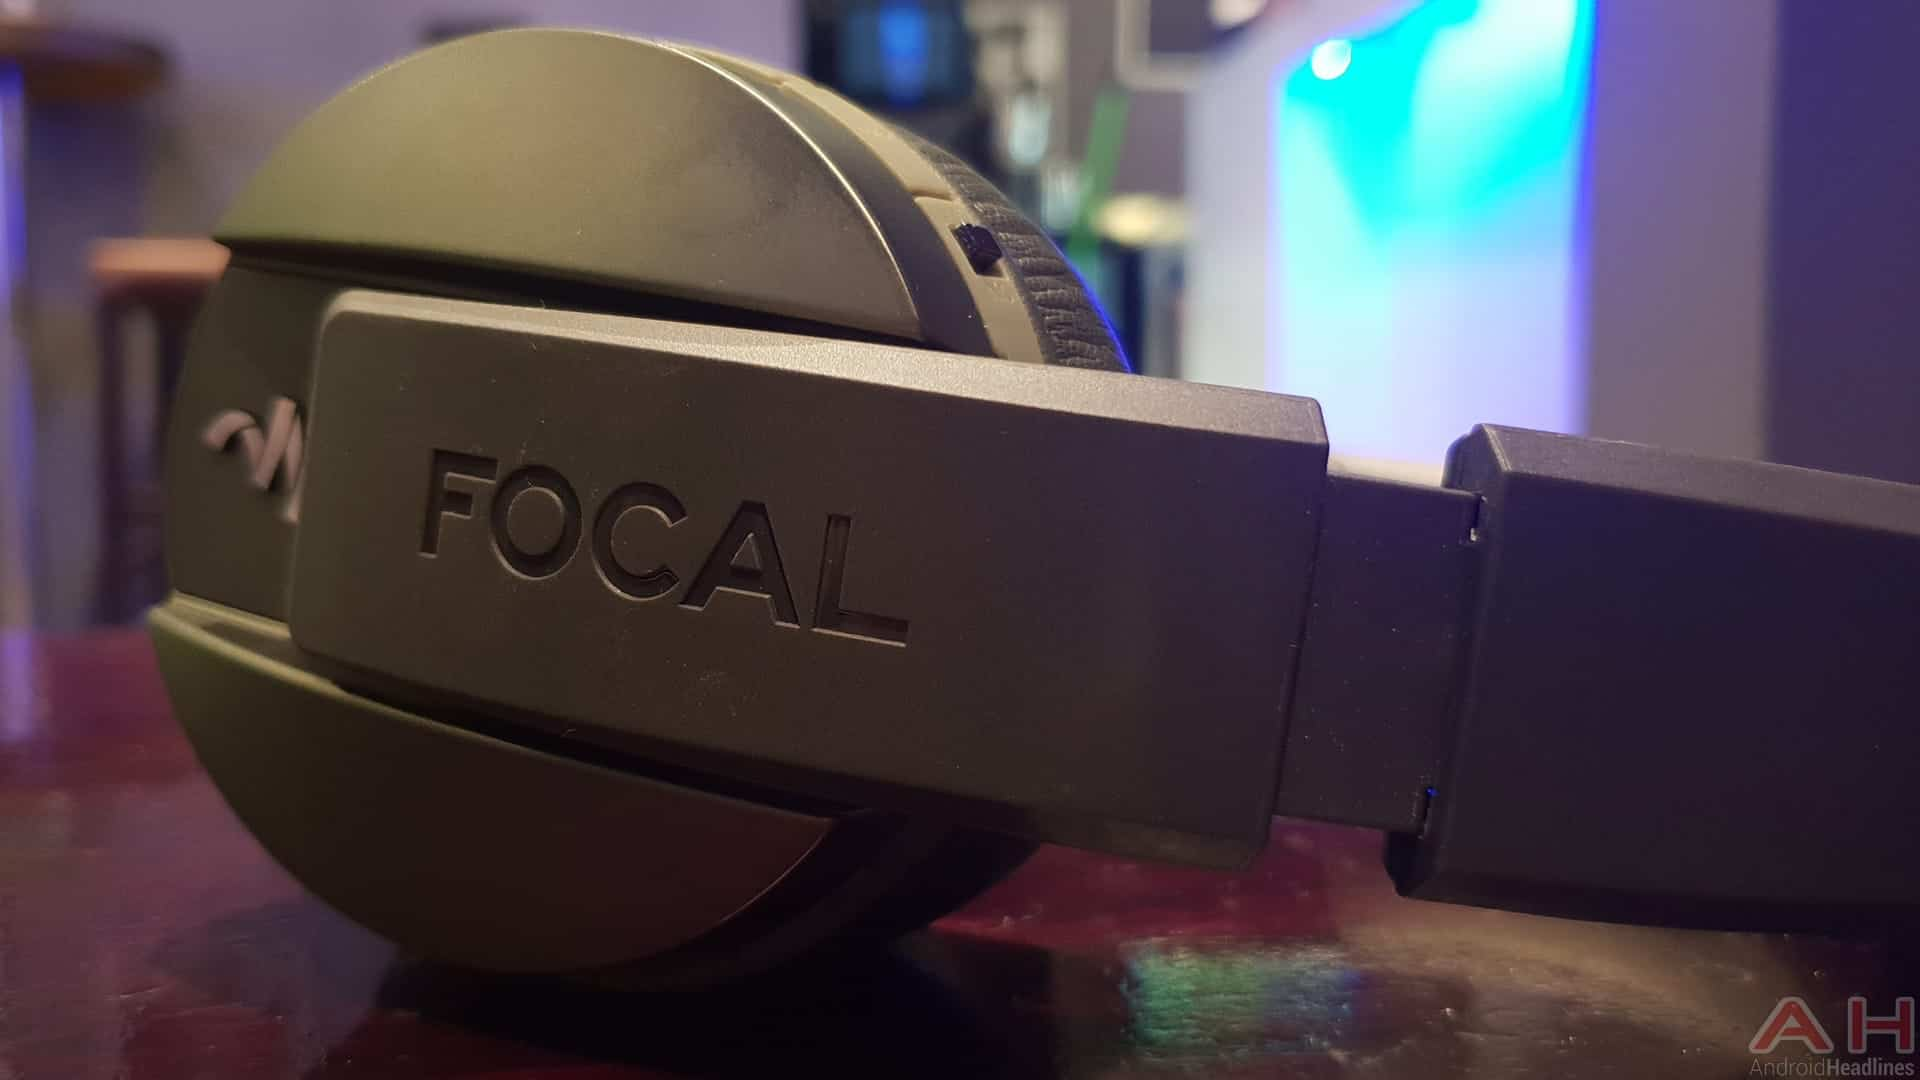 Focal Listen Wireless Chic Headphones AH 4